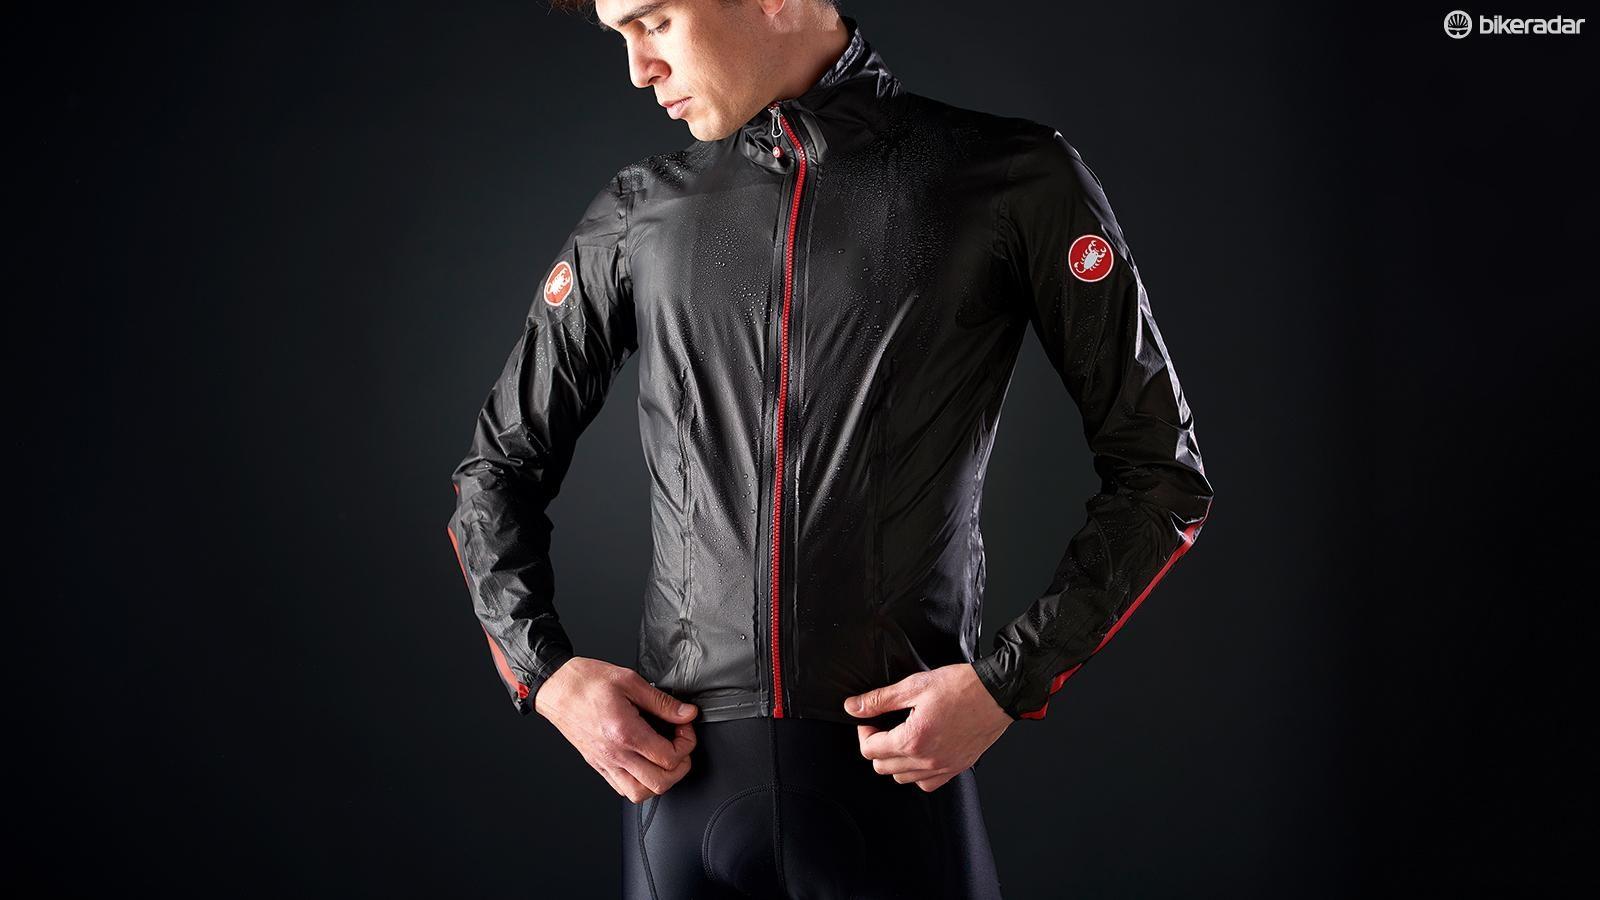 Jacket Bikeradar Review Idro Idro Jacket Review Castelli Jacket Bikeradar Idro Castelli Castelli Review 0ywNnvm8O